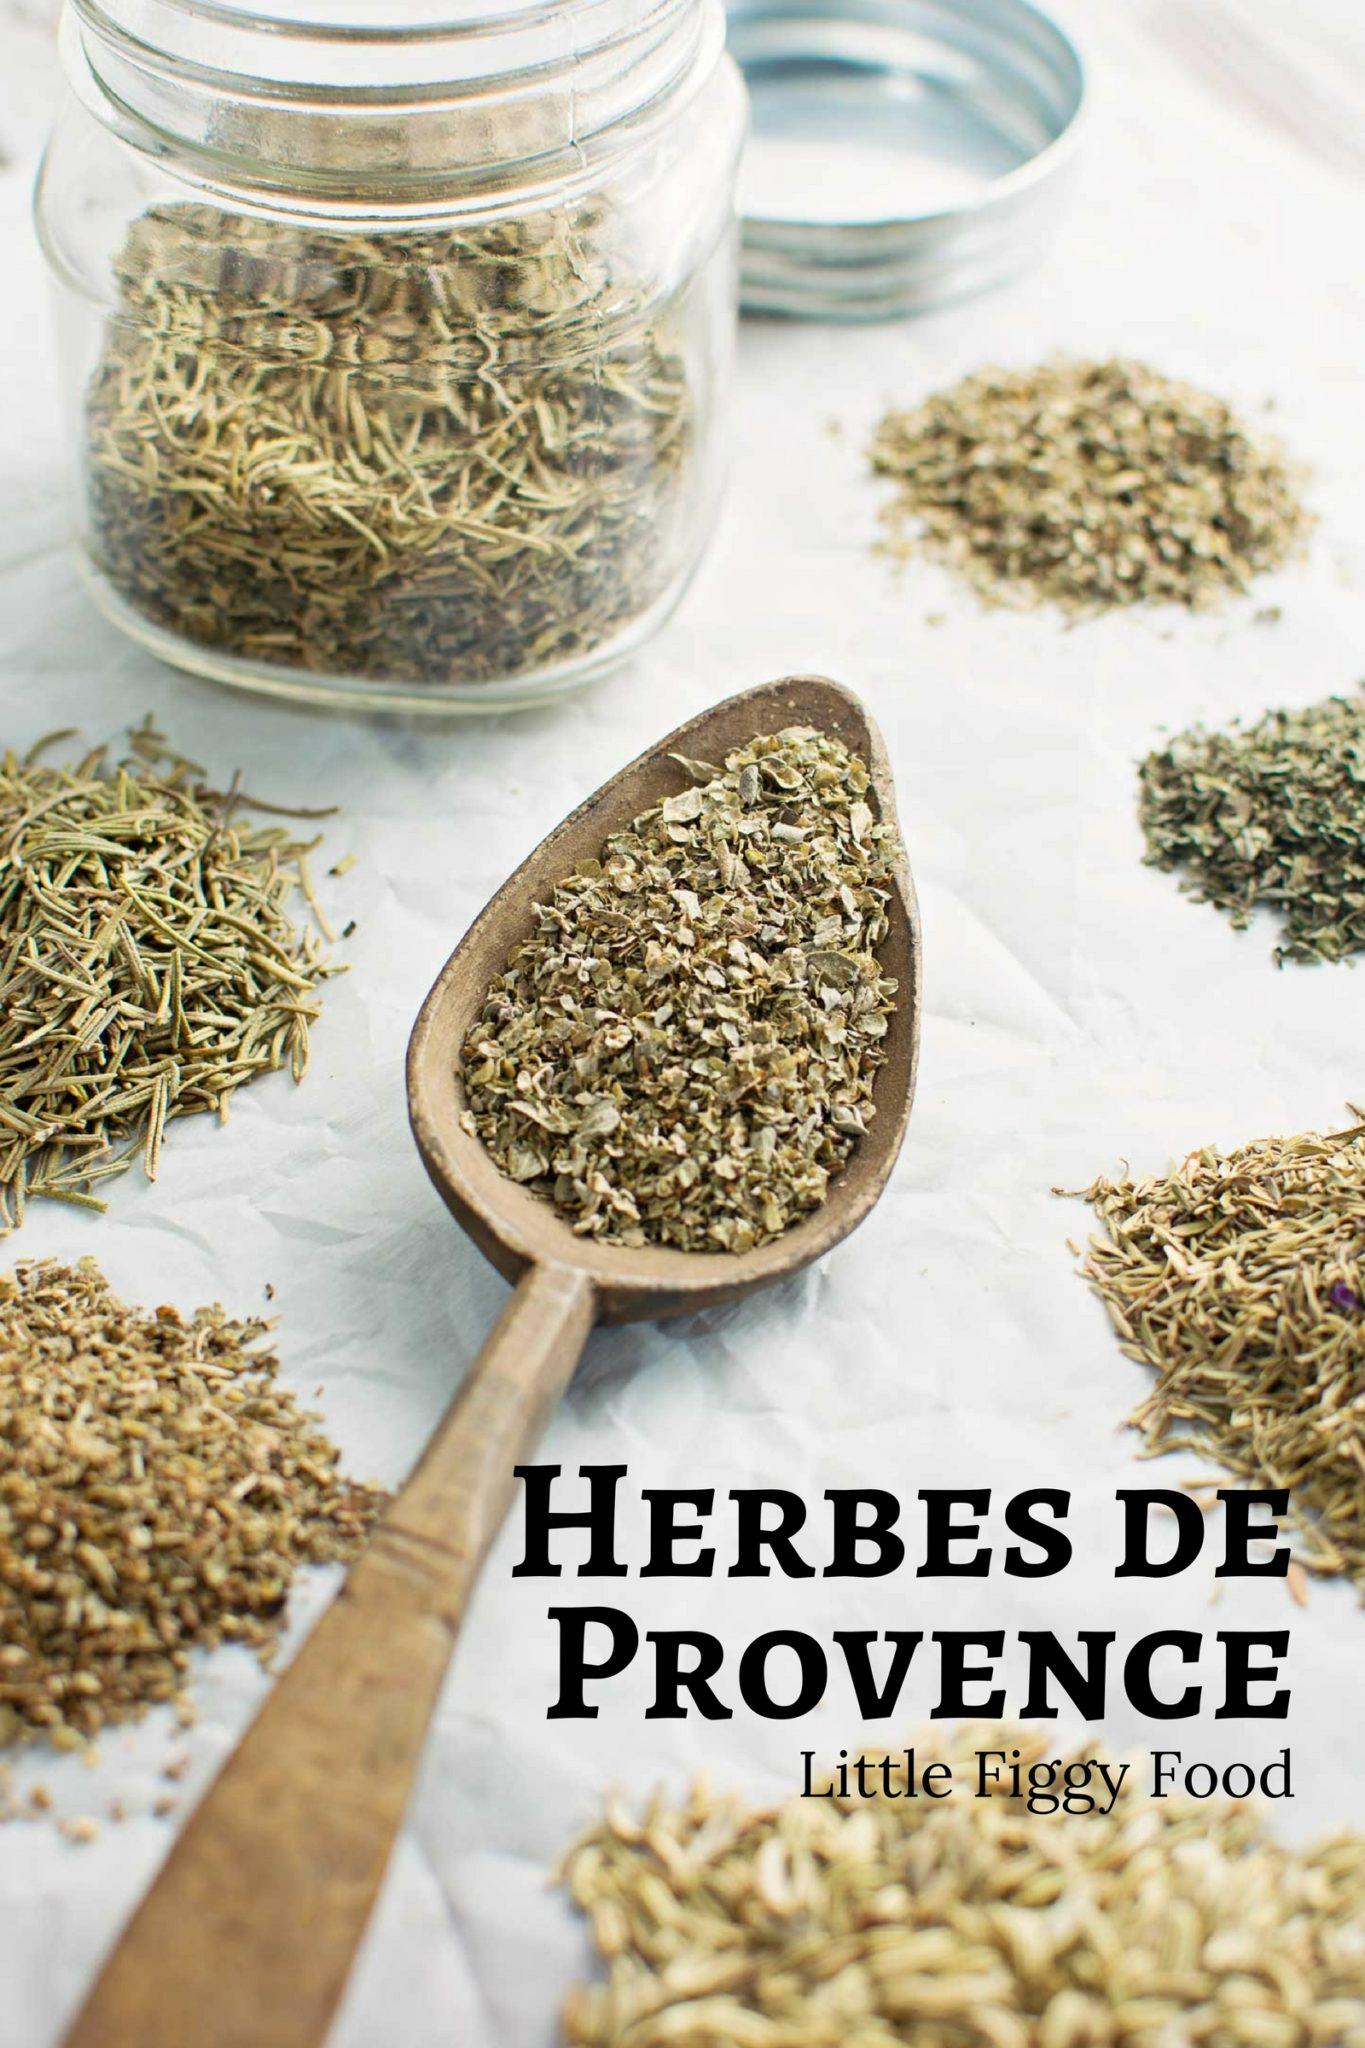 An all rounder herbal blend, Herbes de Provence. Recipe from @LittleFiggyFood